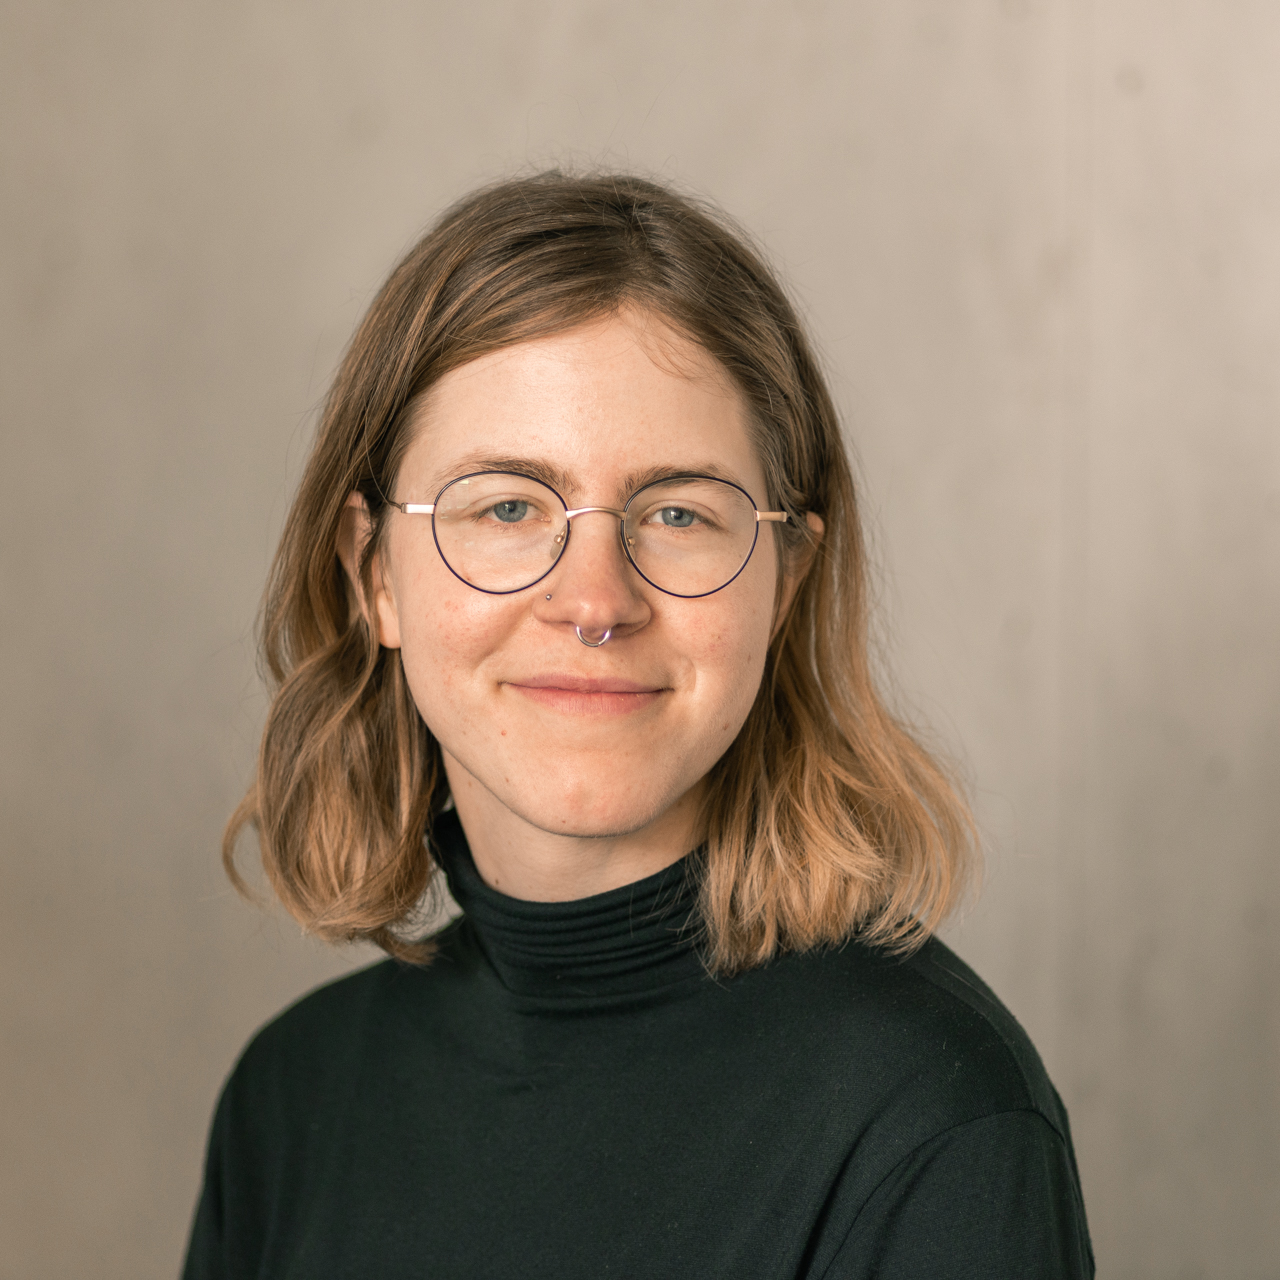 Samantha Melnyk